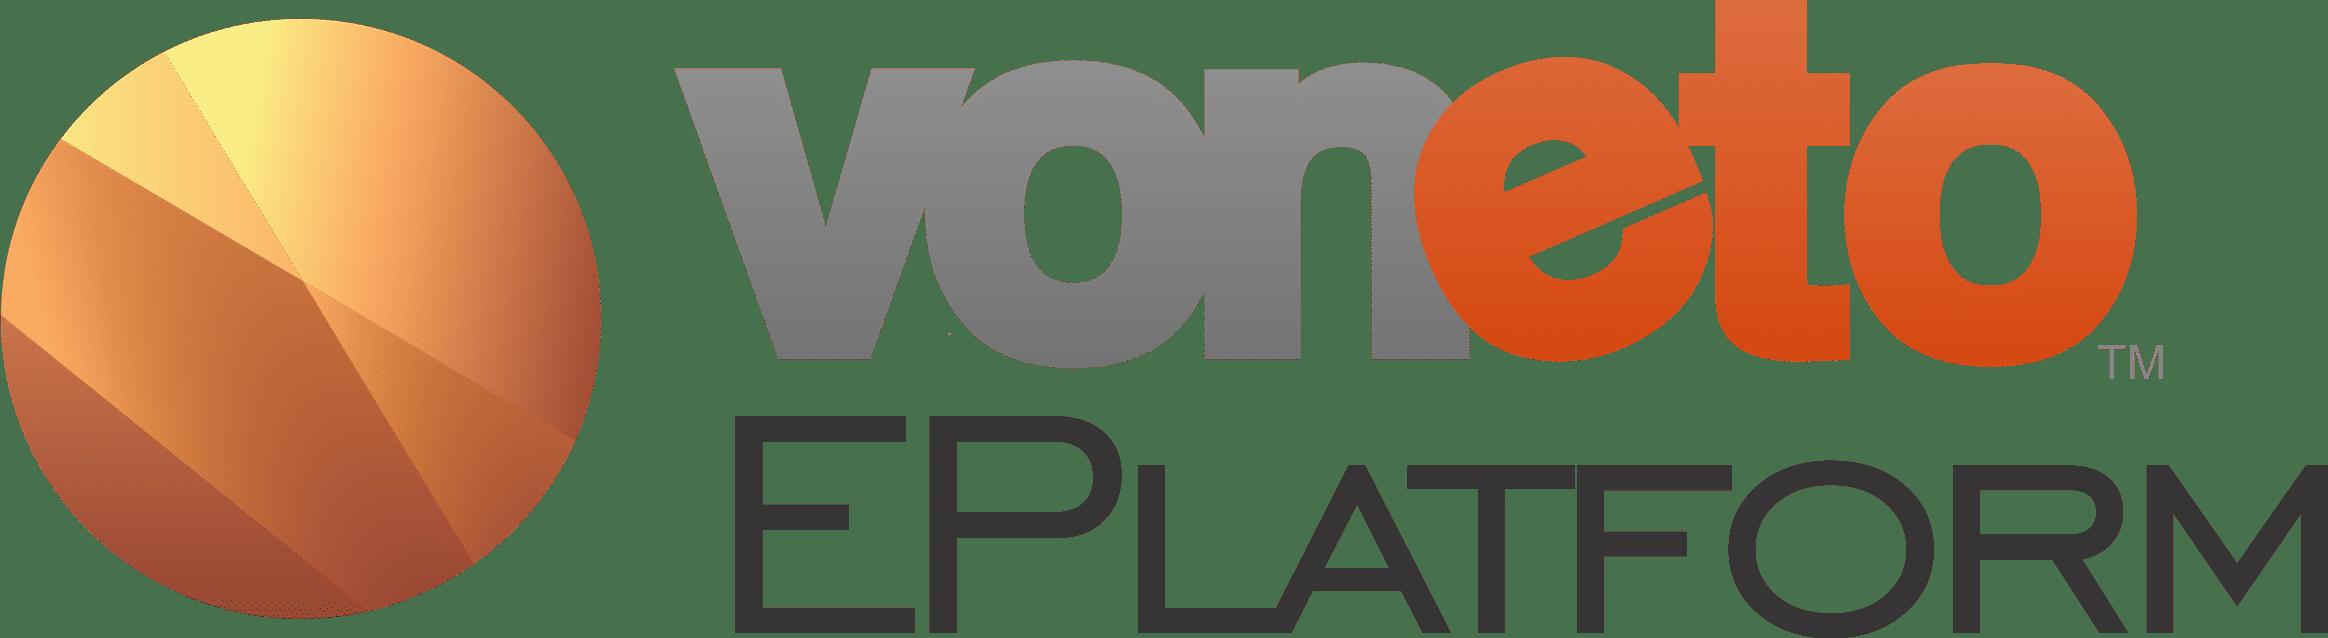 Voneto business communications logo